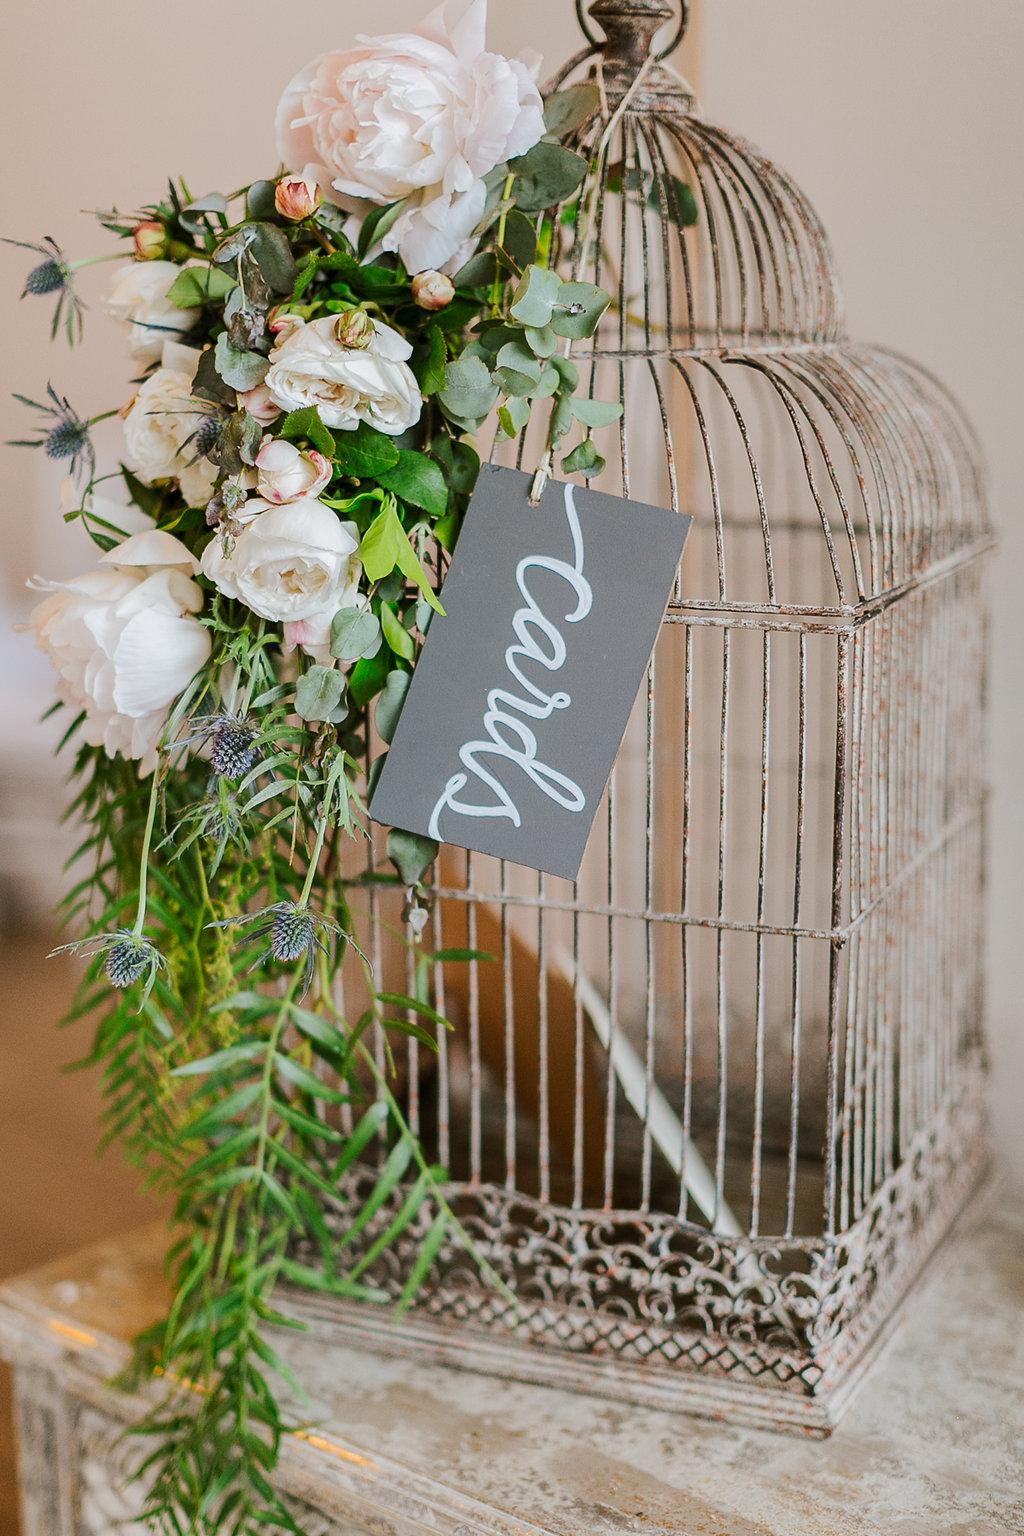 katie_ben_enzo_weddings_ironbark_hill_hunter_valley_gez_xavier_mansfield_photography_2018-501.jpg